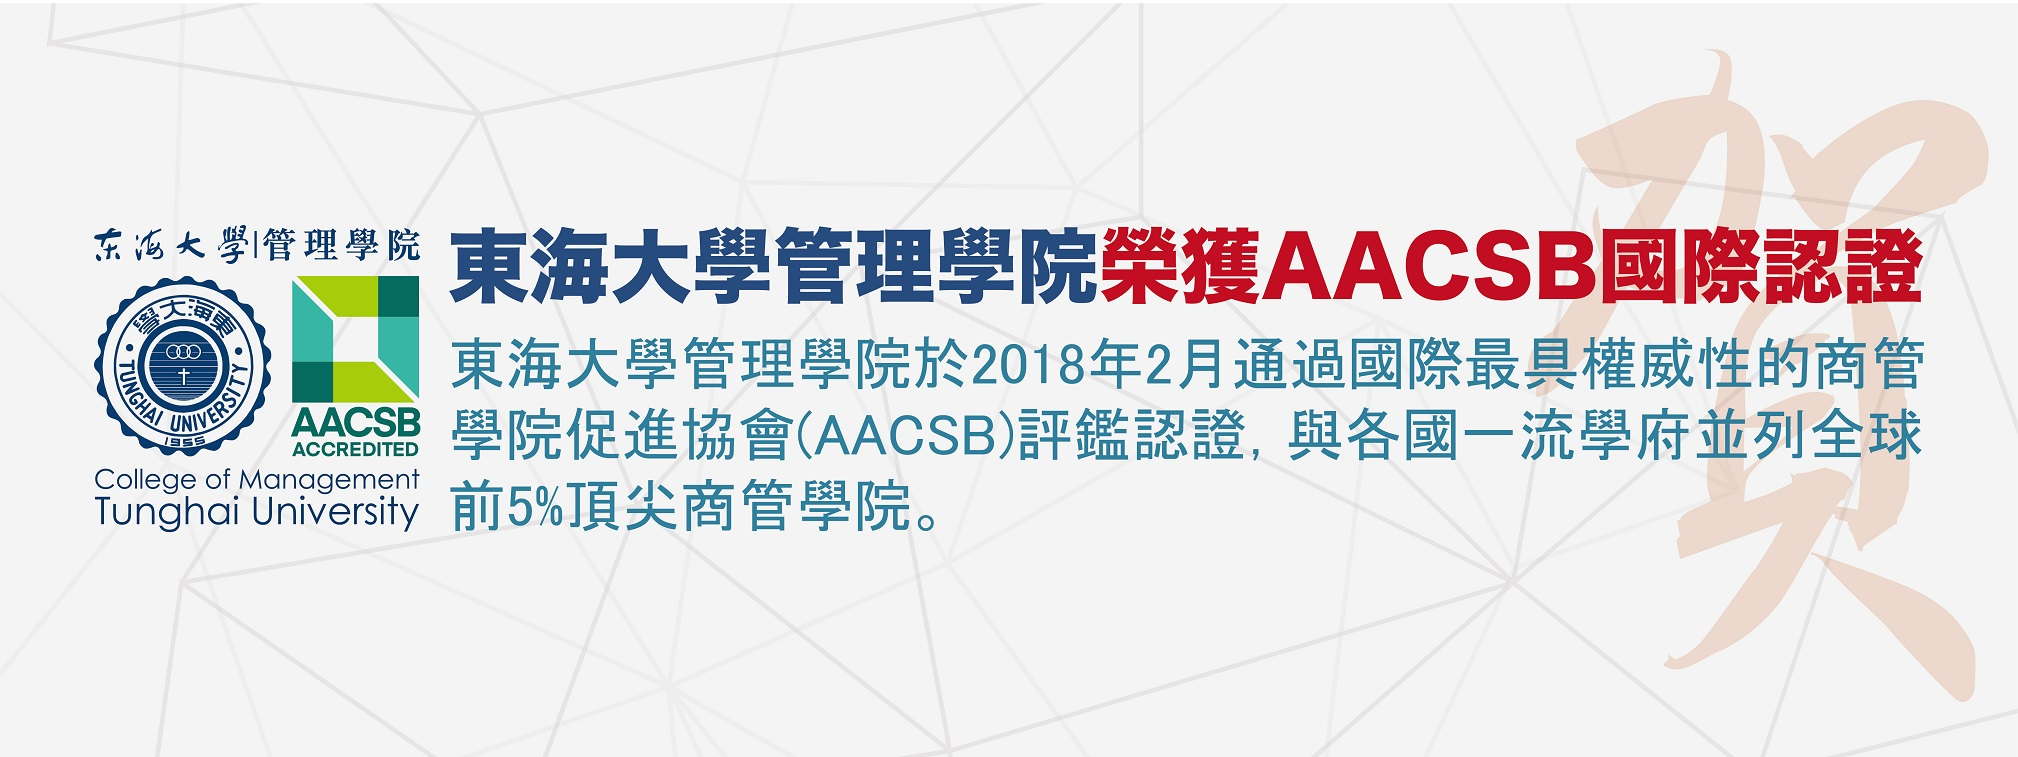 AACSB!!